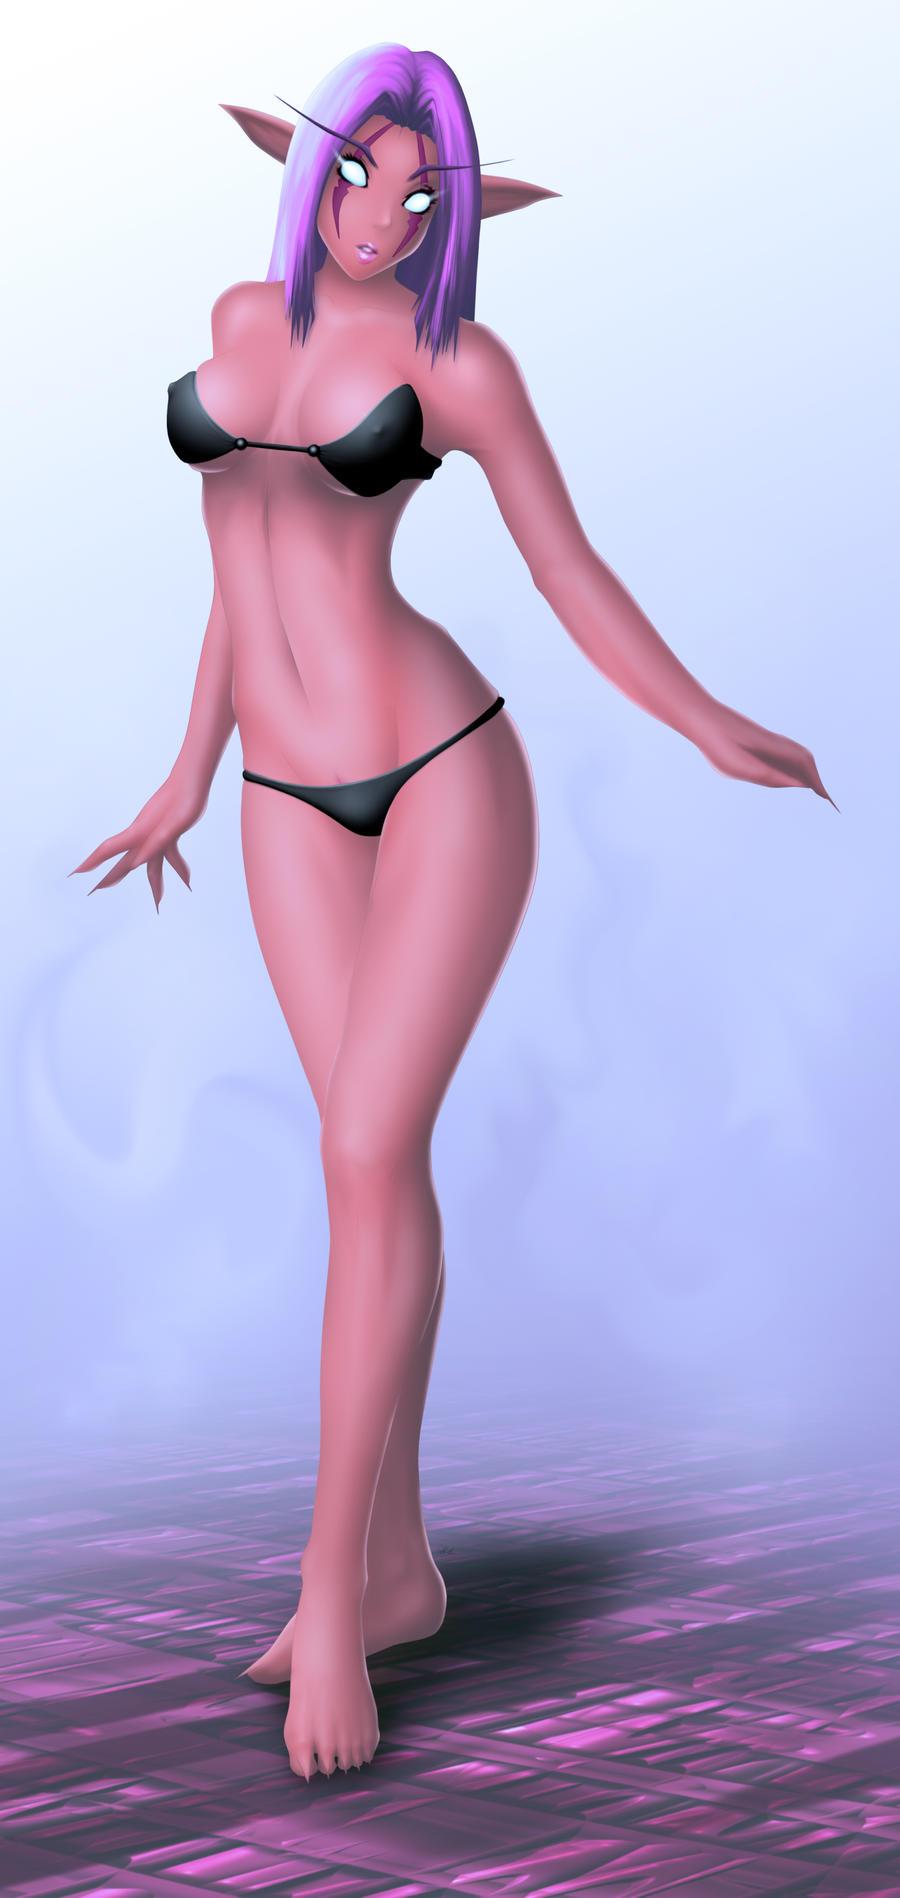 mia khalifa nudes